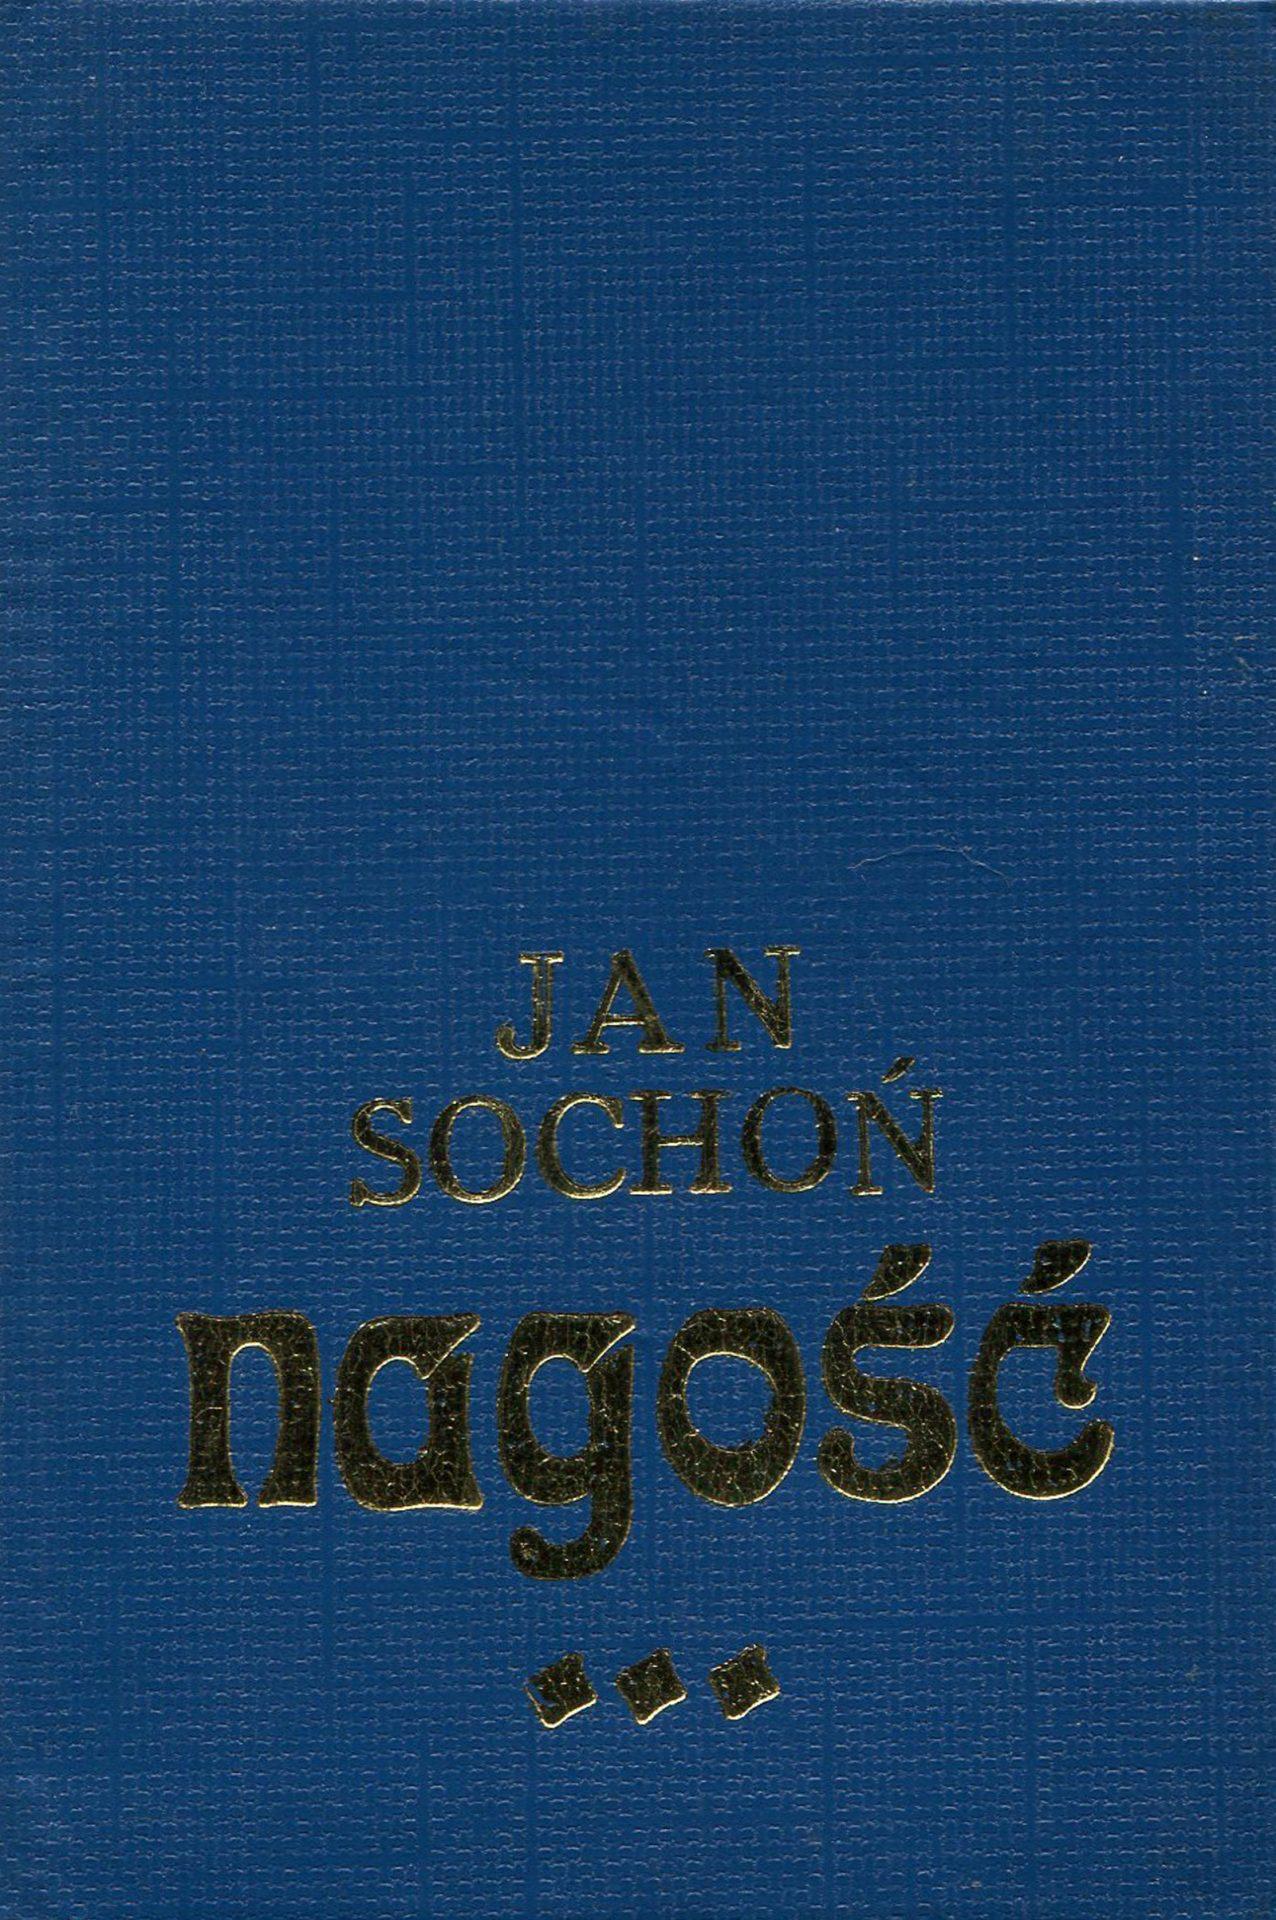 Nagość wielokrotna - Jan Sochoń